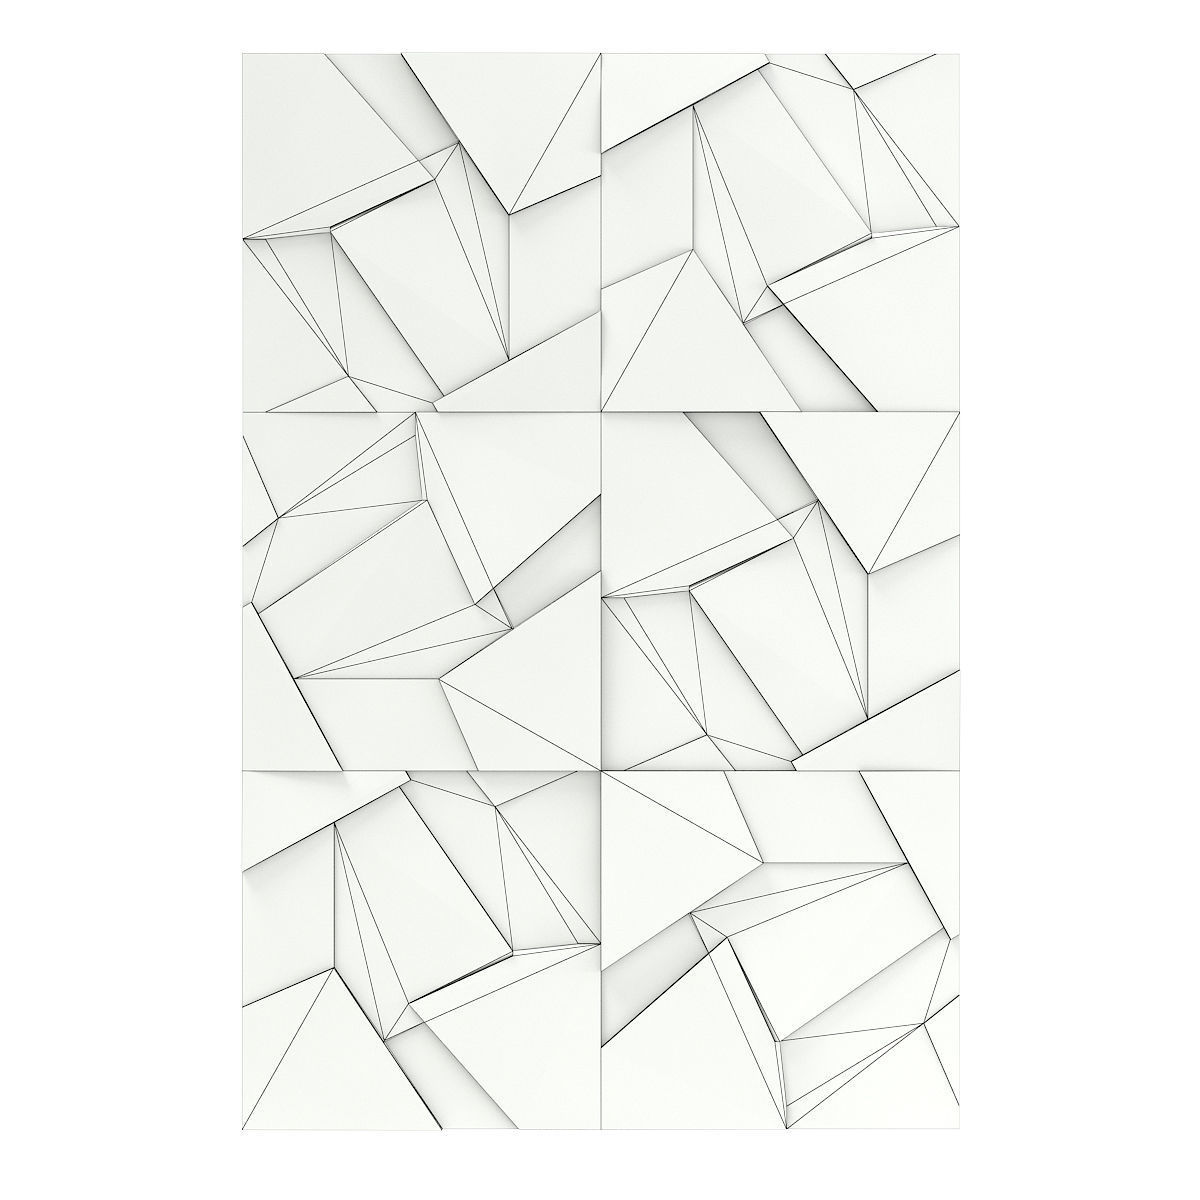 Cracked Metal Wall Panel